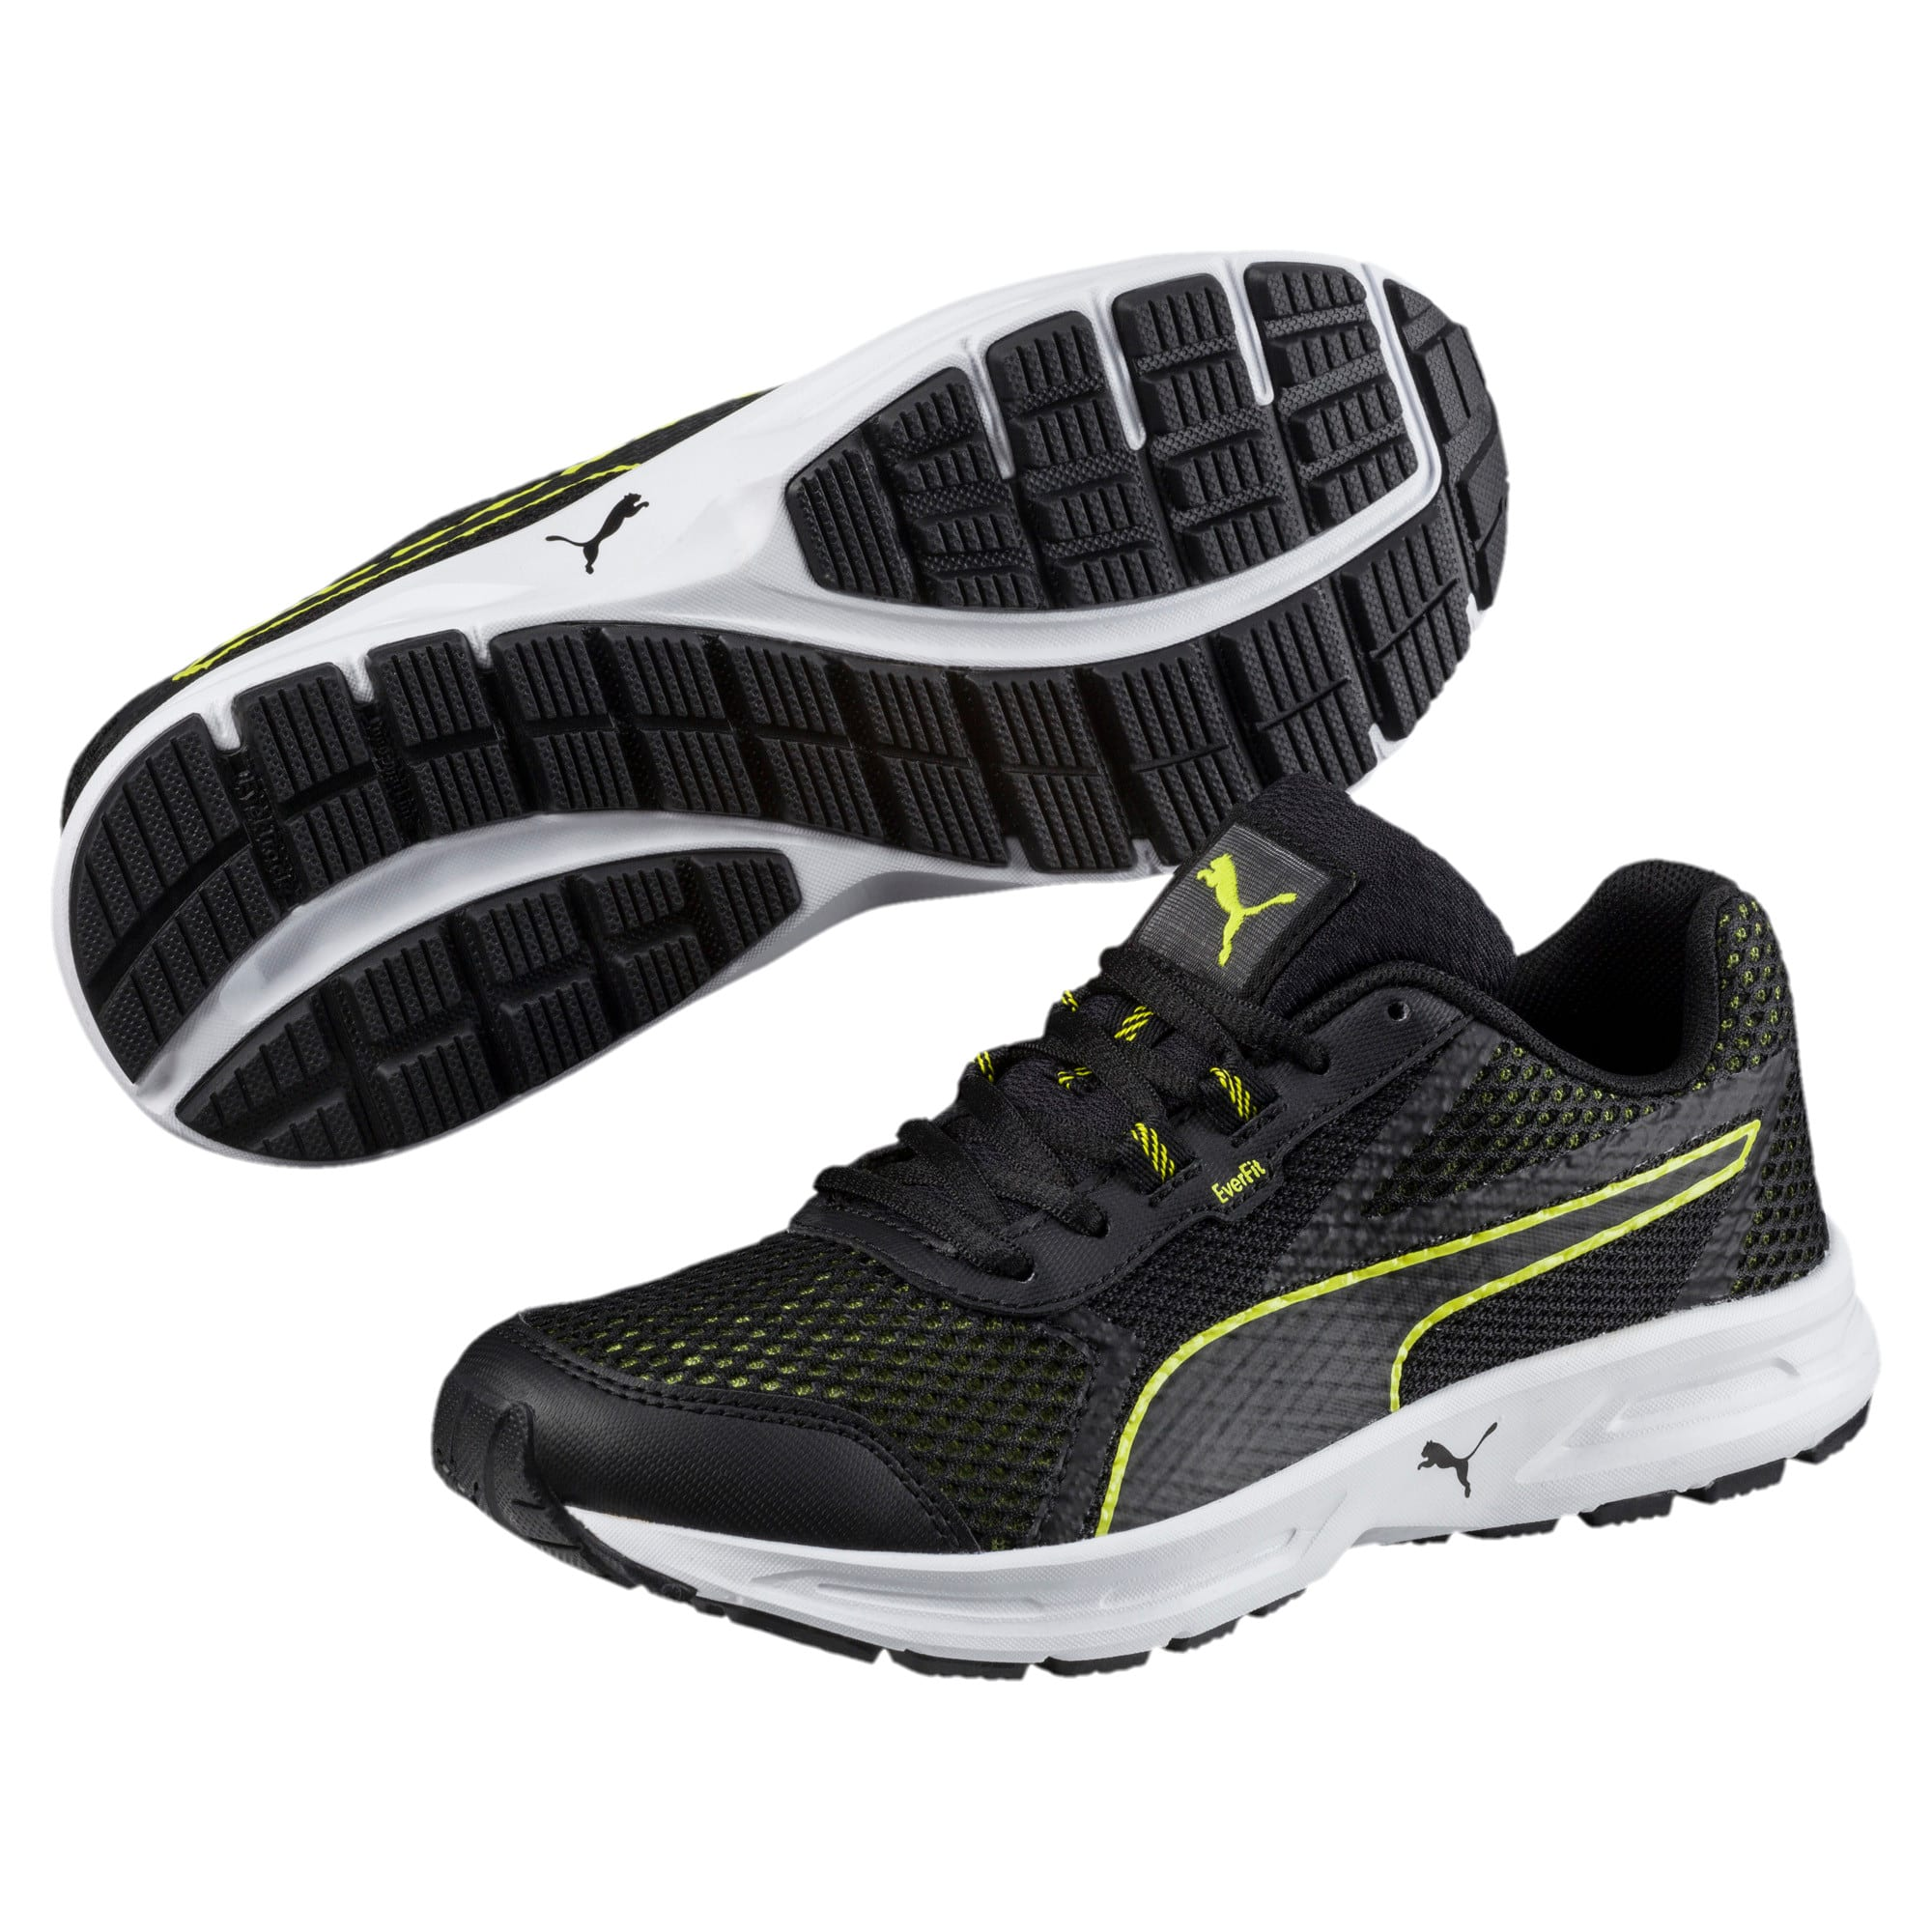 Thumbnail 2 of Essential Runner Kids' Running Shoes, Puma Black-Nrgy Yellow, medium-IND